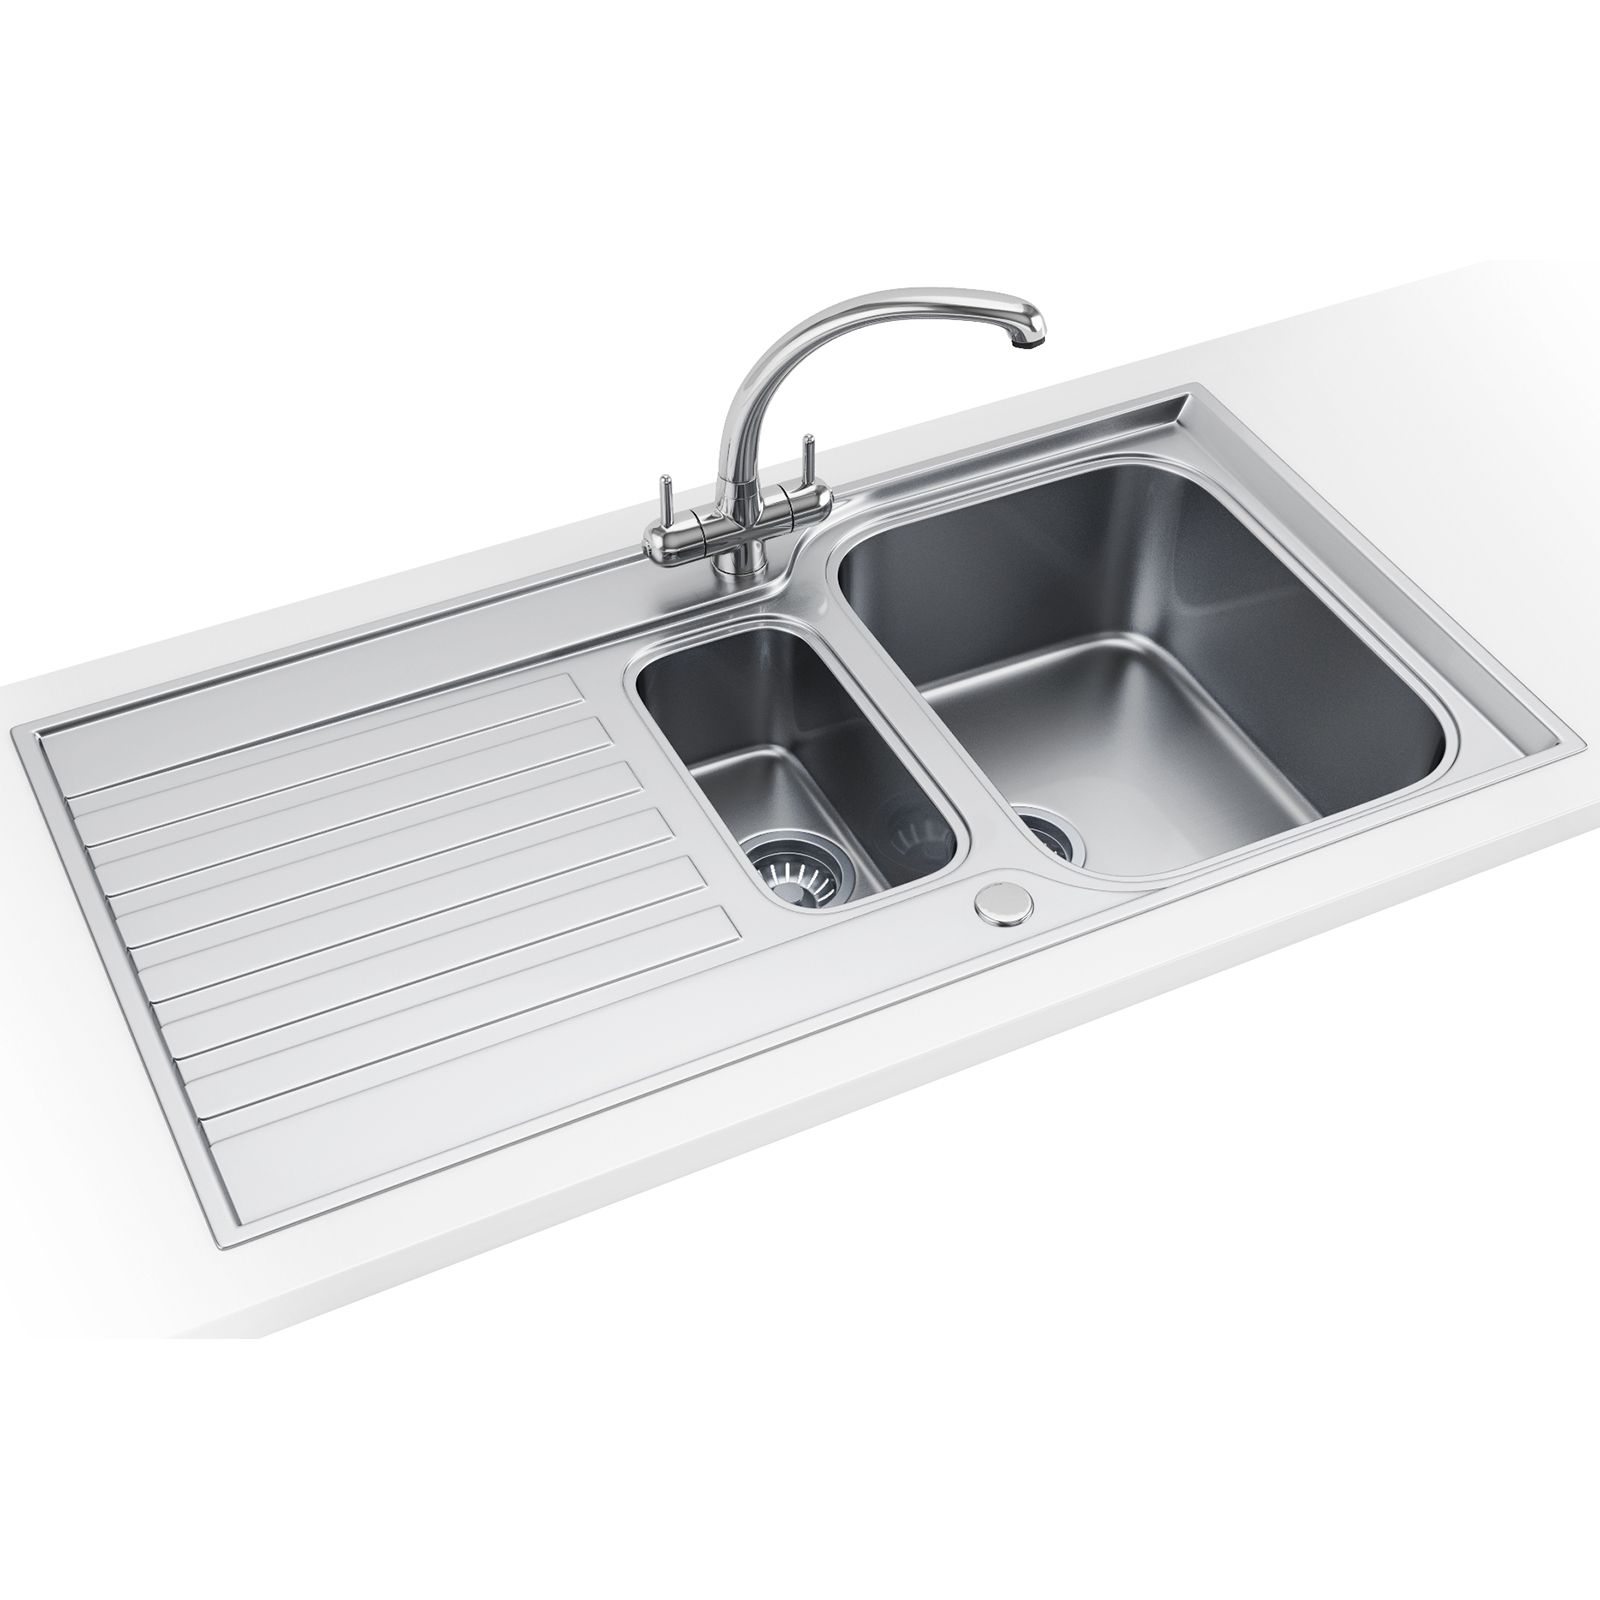 Franke Ascona Asx 651 Stainless Steel 1 5 Bowl Inset Sink Foto Inspiration Waschbecken Inspiration